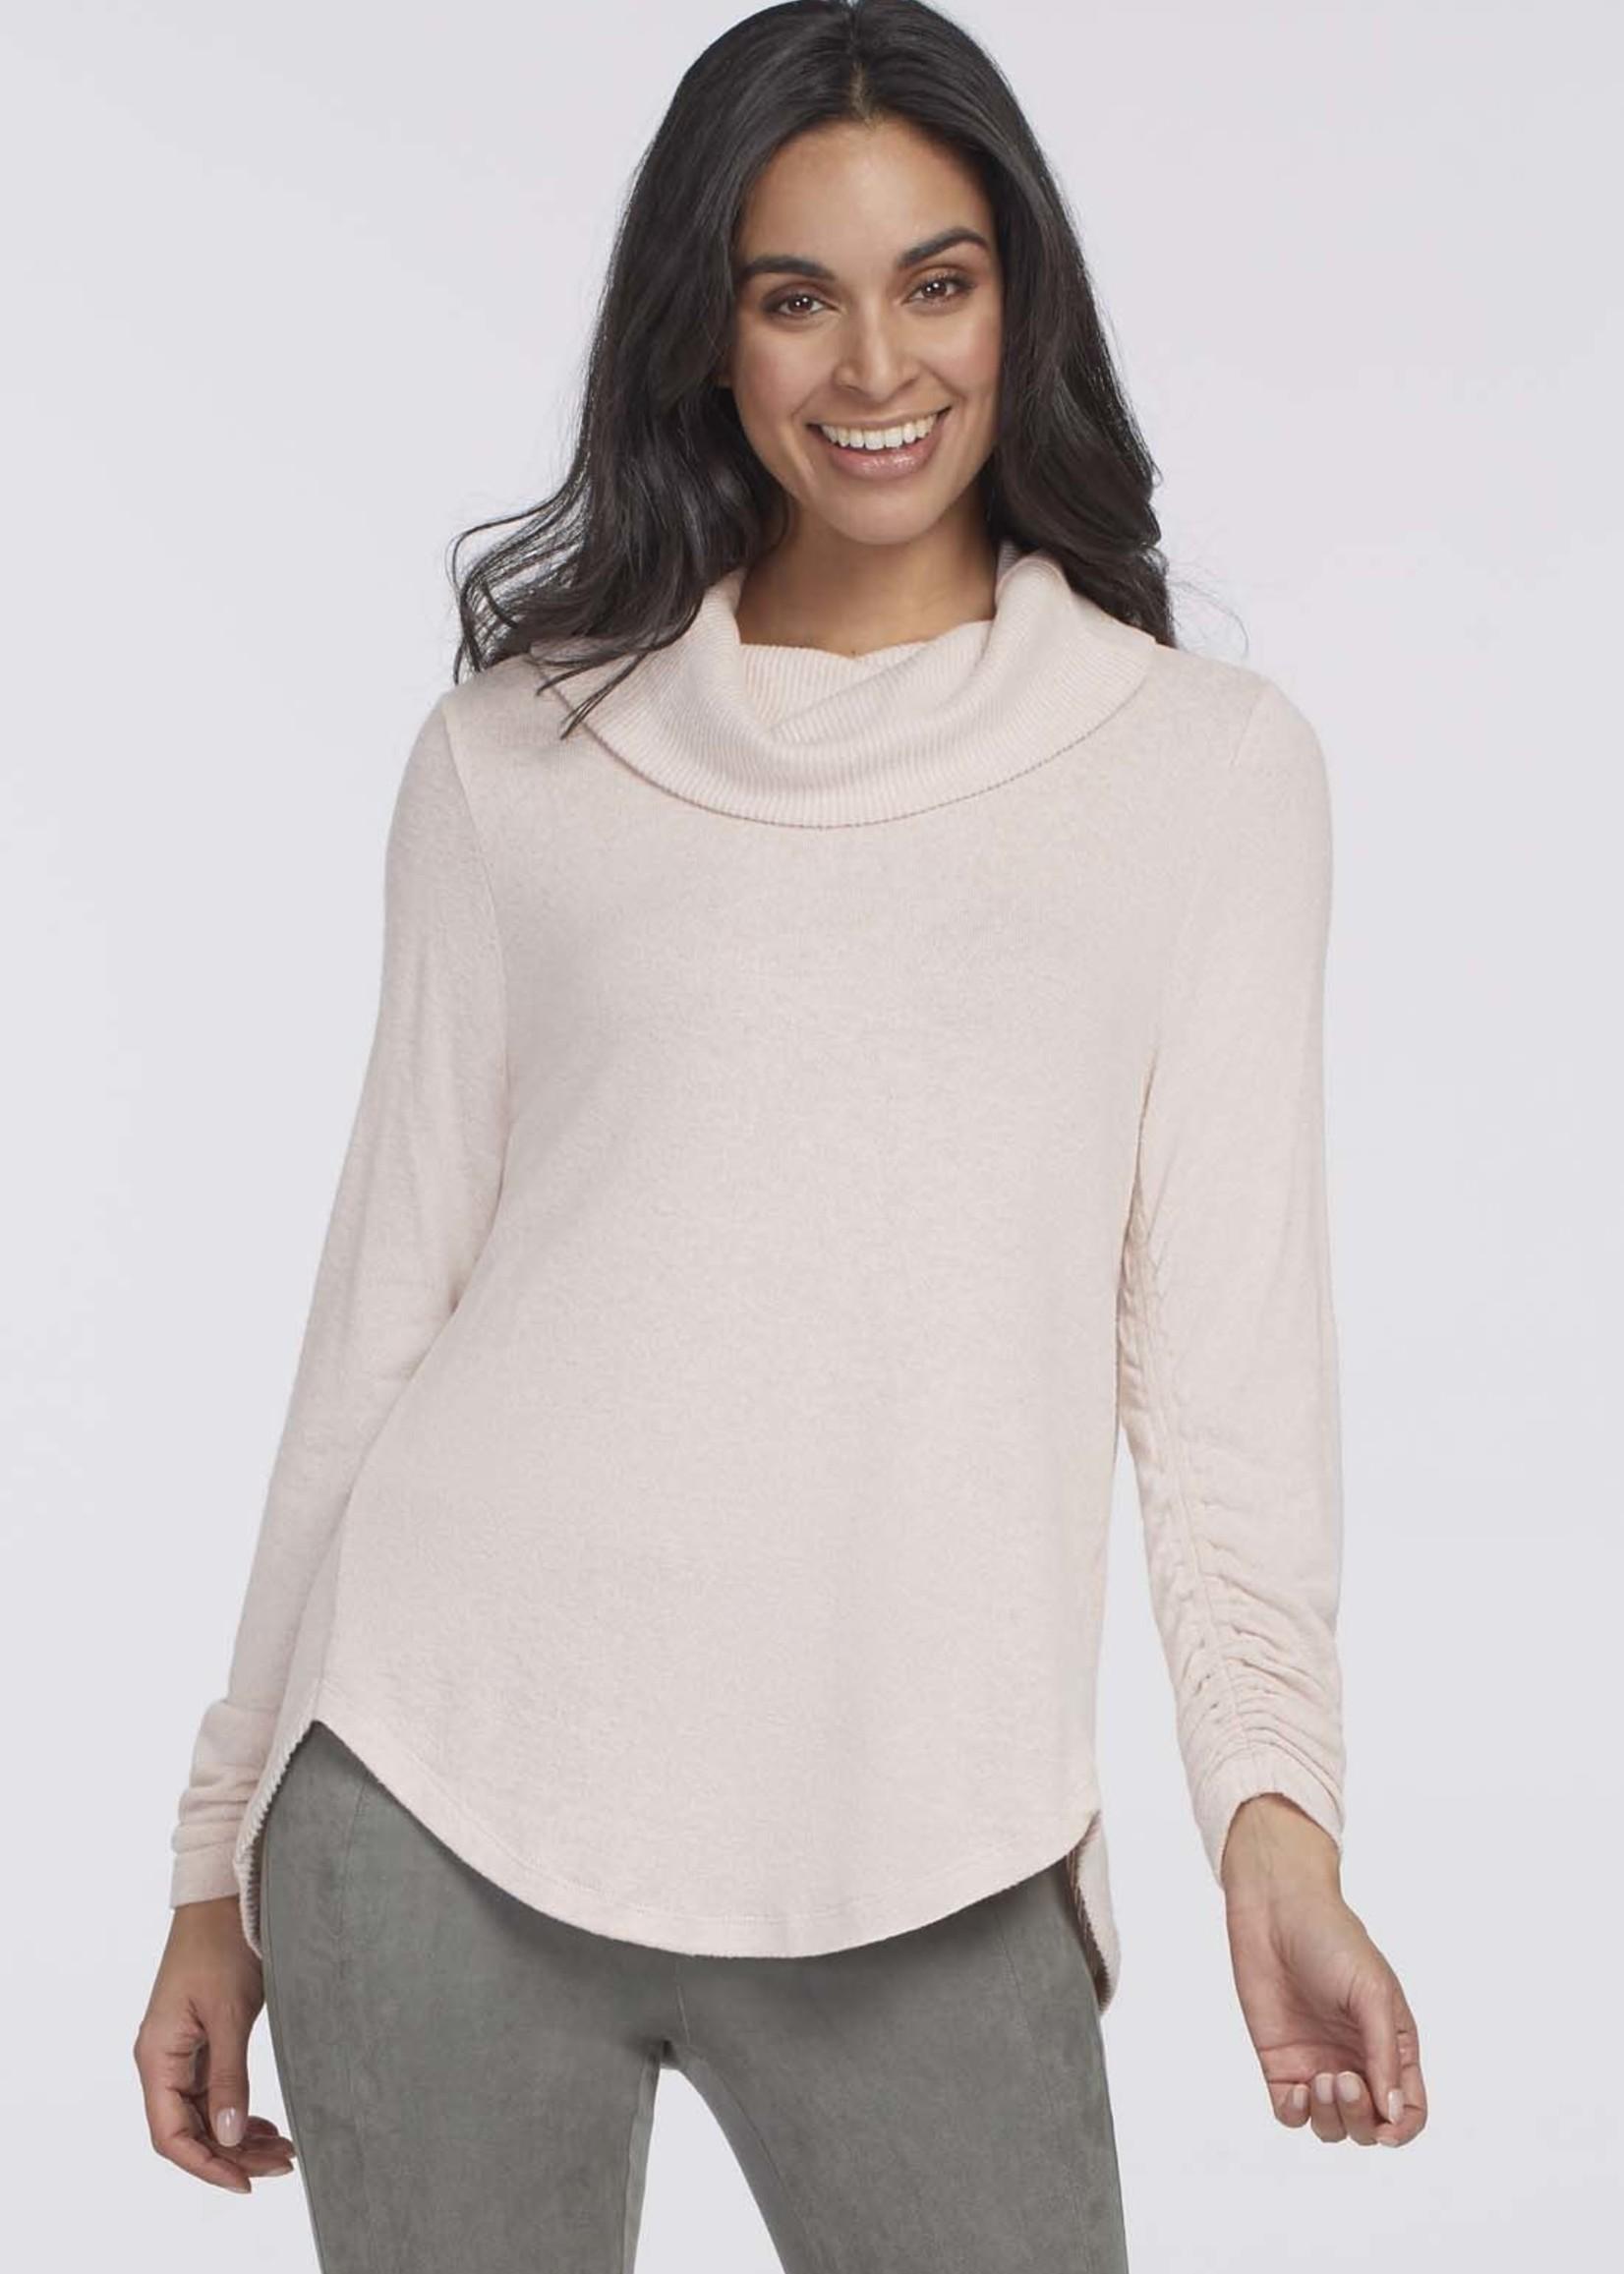 Tribal Tribal  Cowl Neck Sweater w/ Shirring Details  Blush